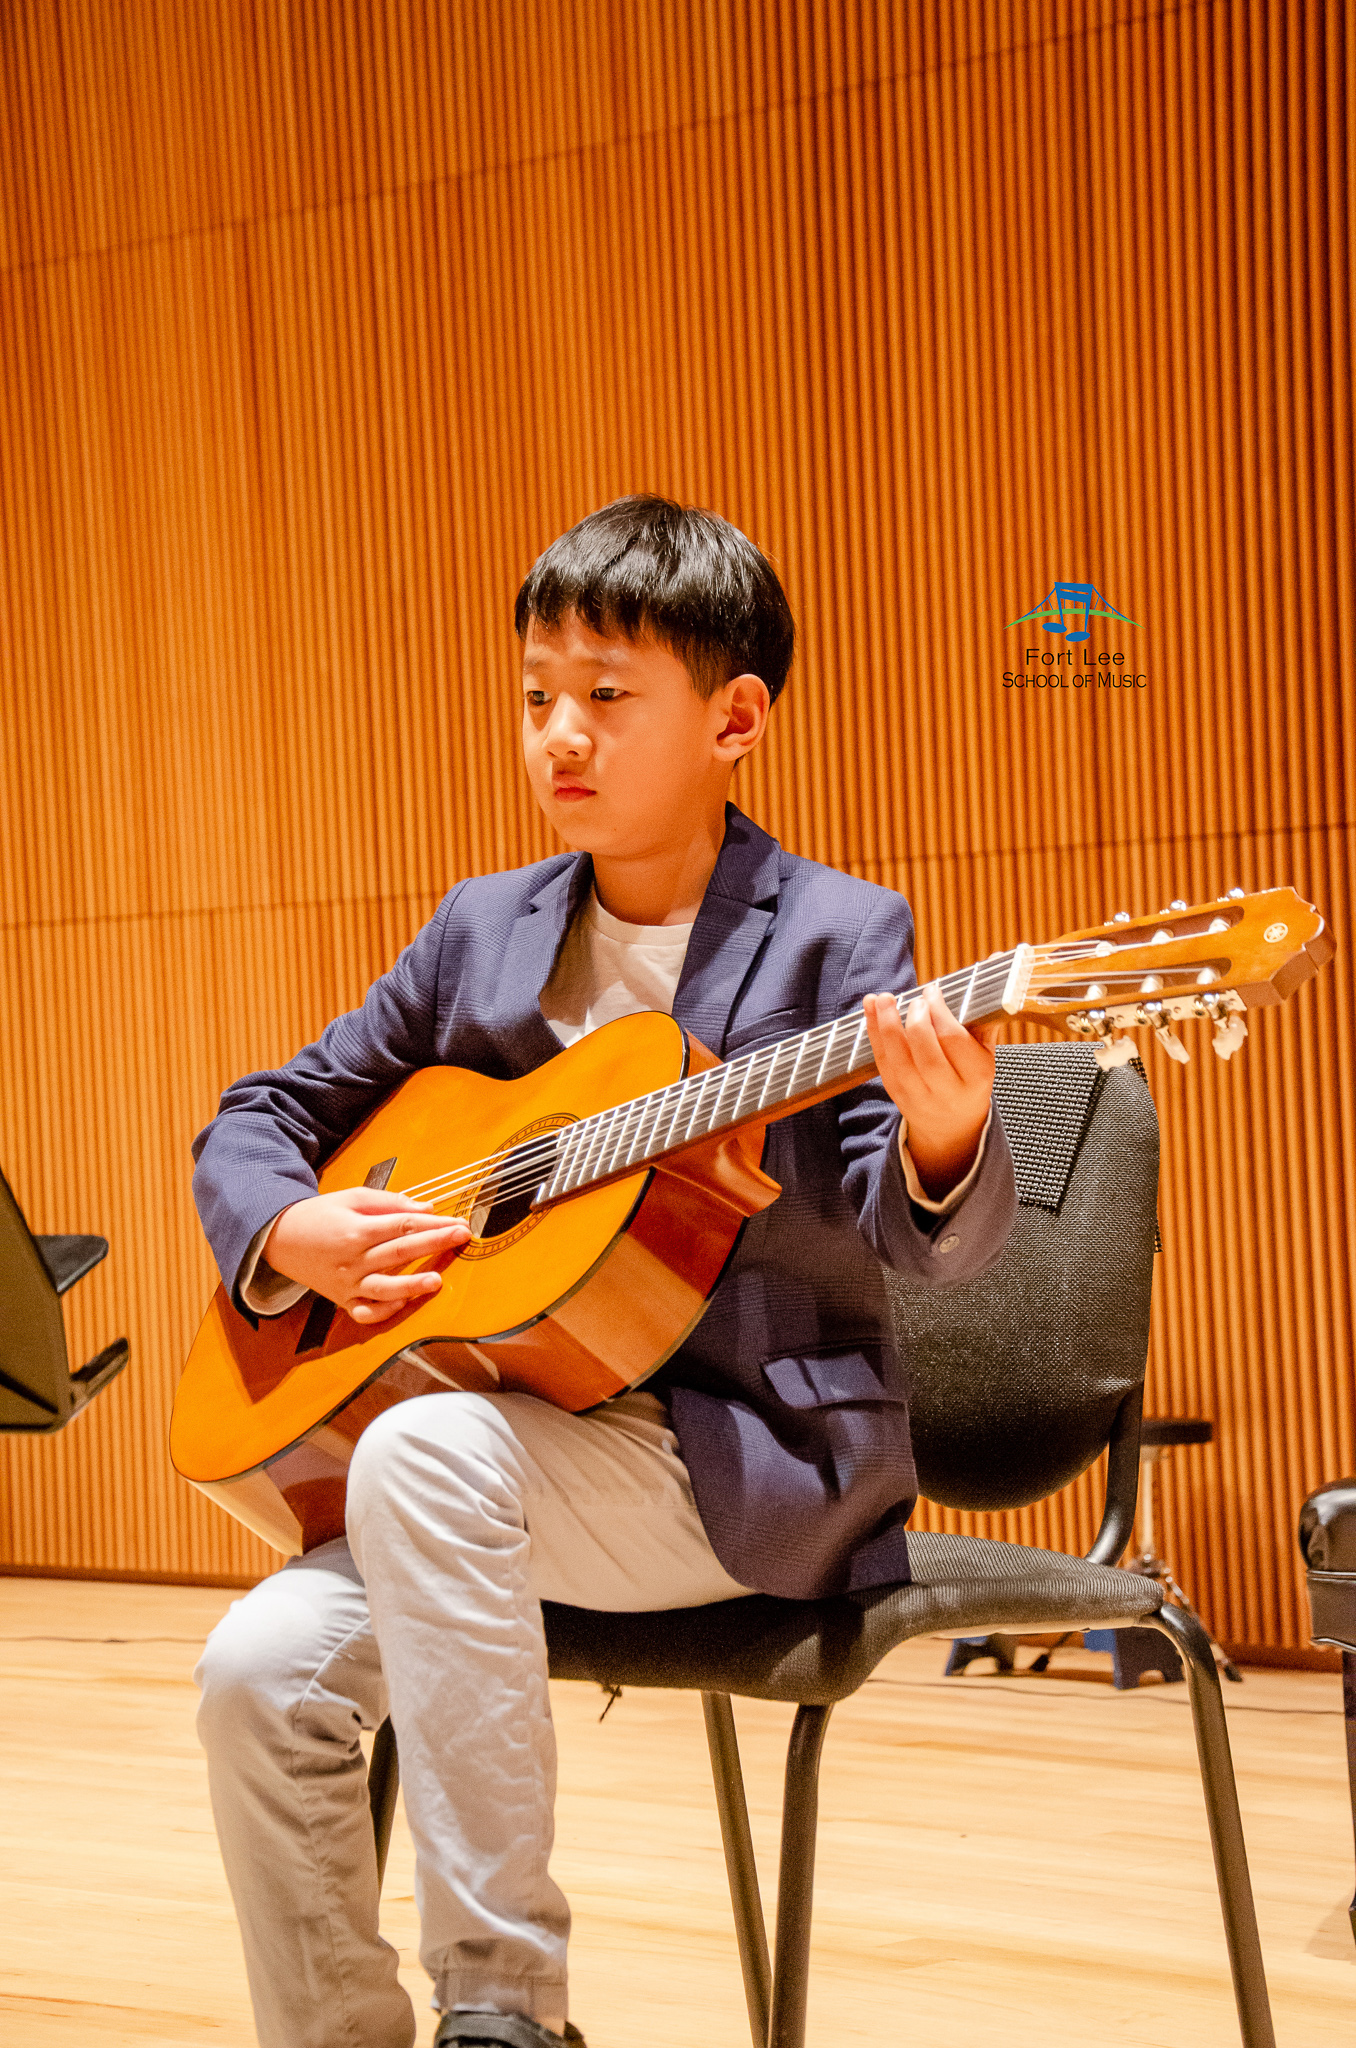 guitar-lessons-tenafly.jpg